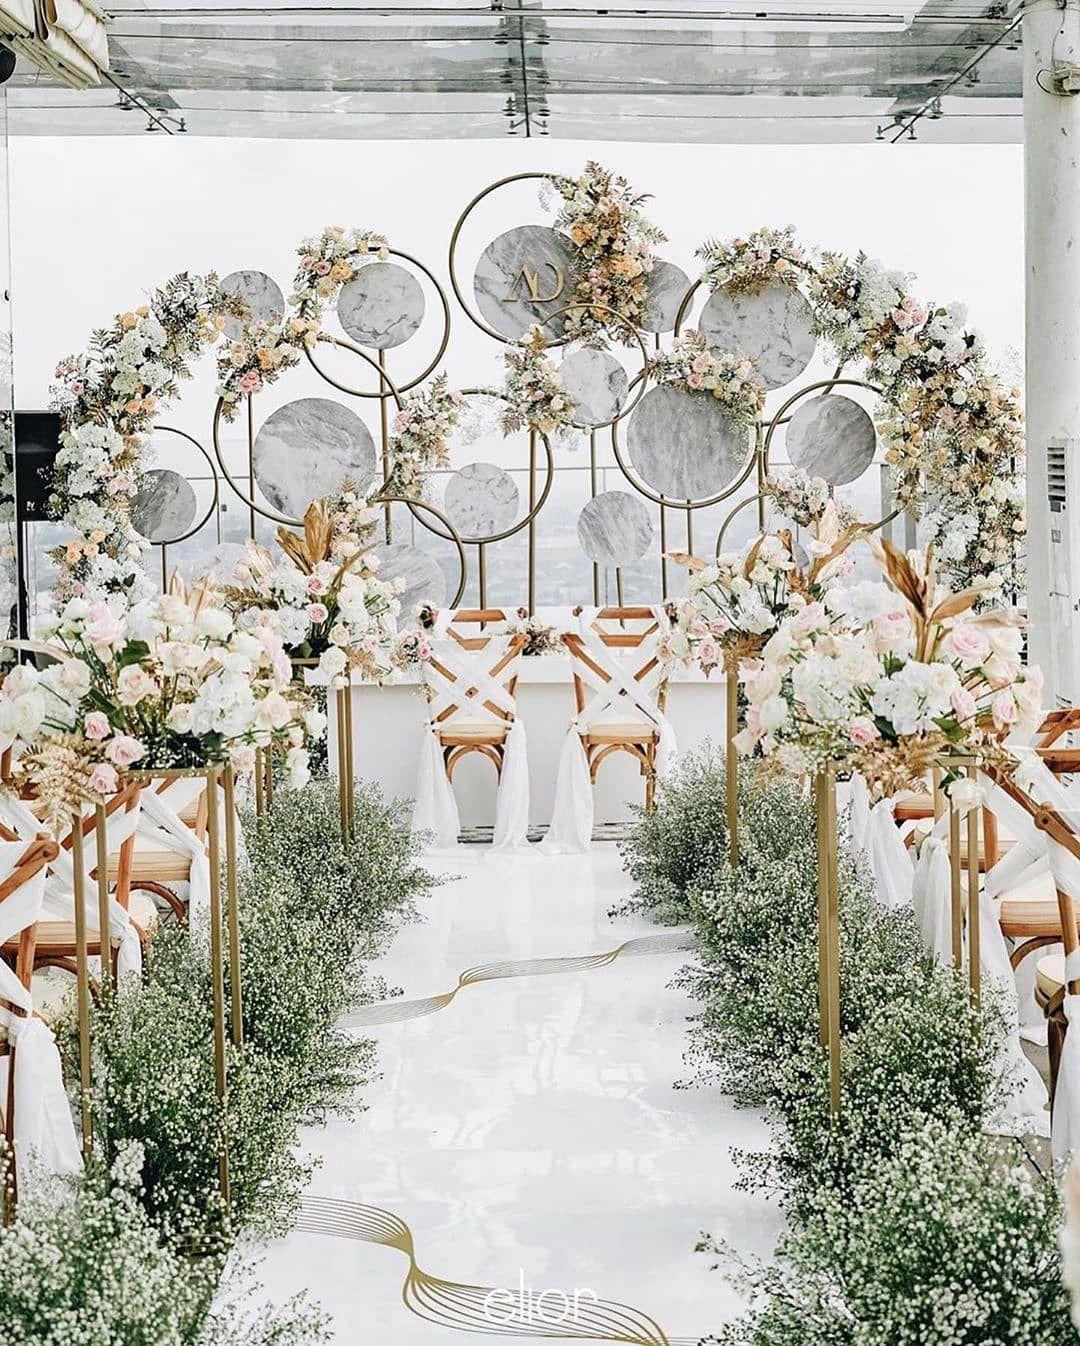 Modern Wedding Australia On Instagram Imagine Floating Down This Aisle Talk About A Wedding Dream D In 2020 Brides Table Wedding Marketing Wedding Modern